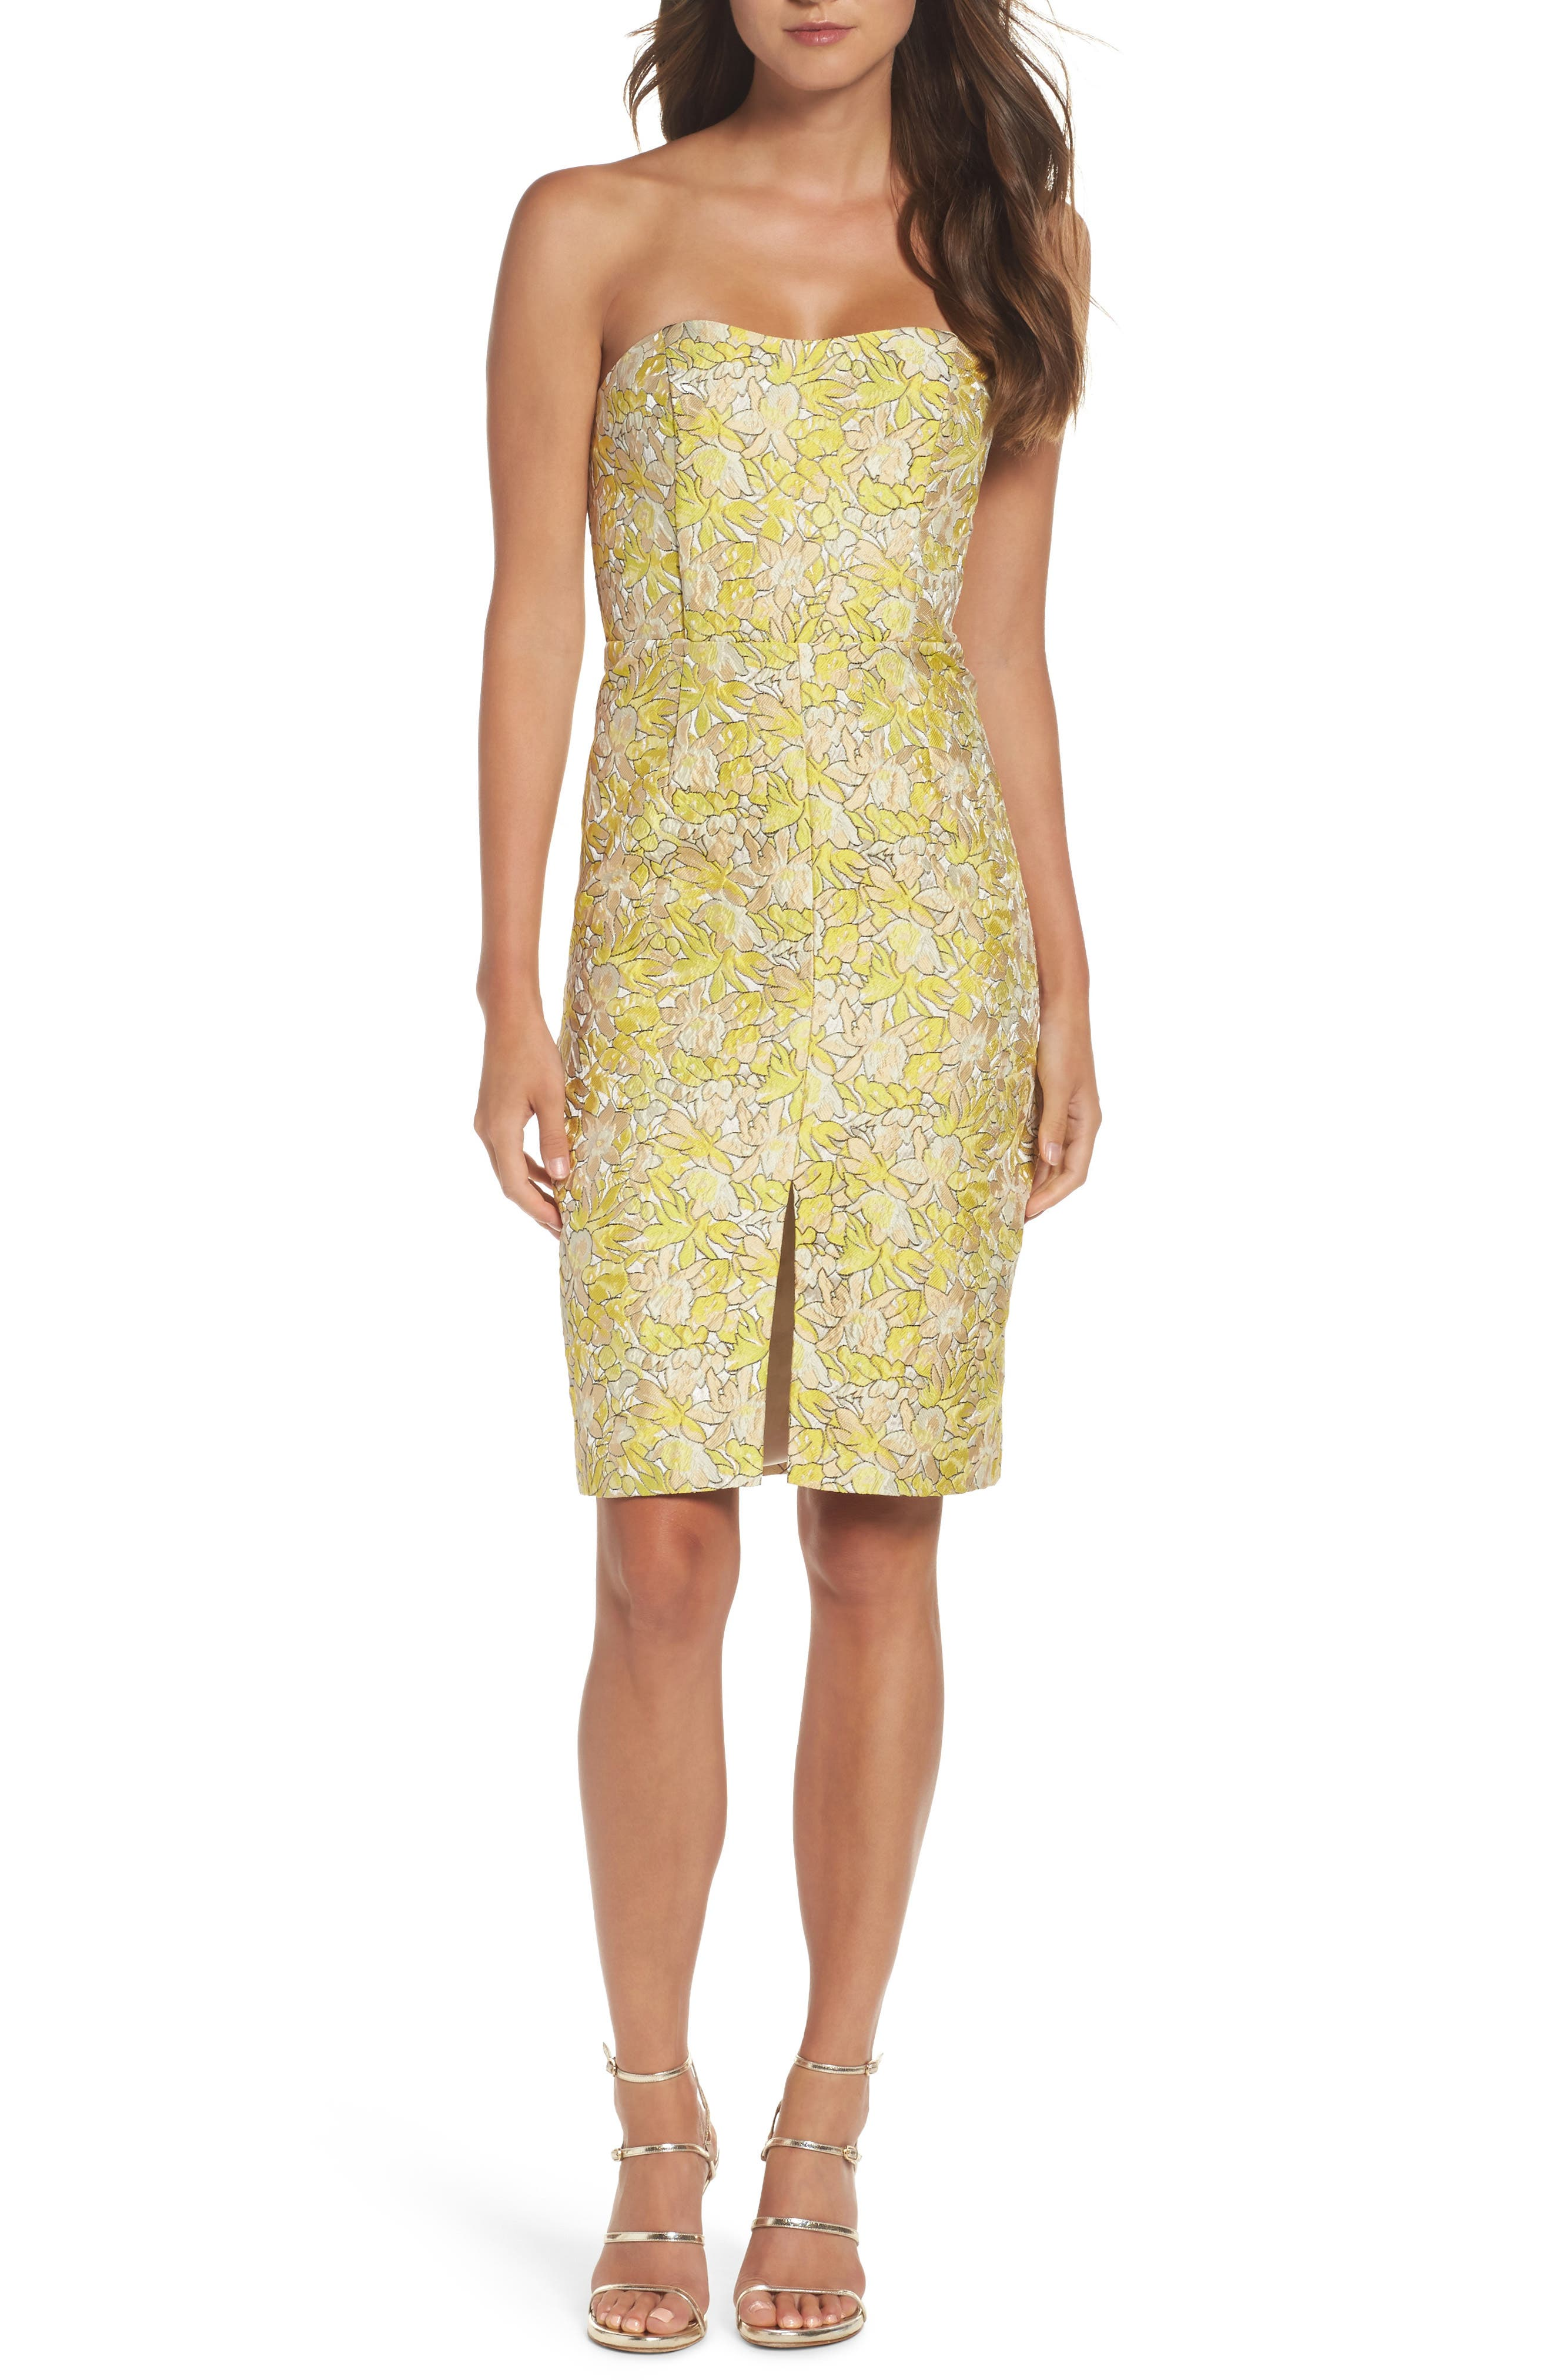 Alternate Image 1 Selected - BB Dakota Occasion Gretta Strapless Jacquard Sheath Dress